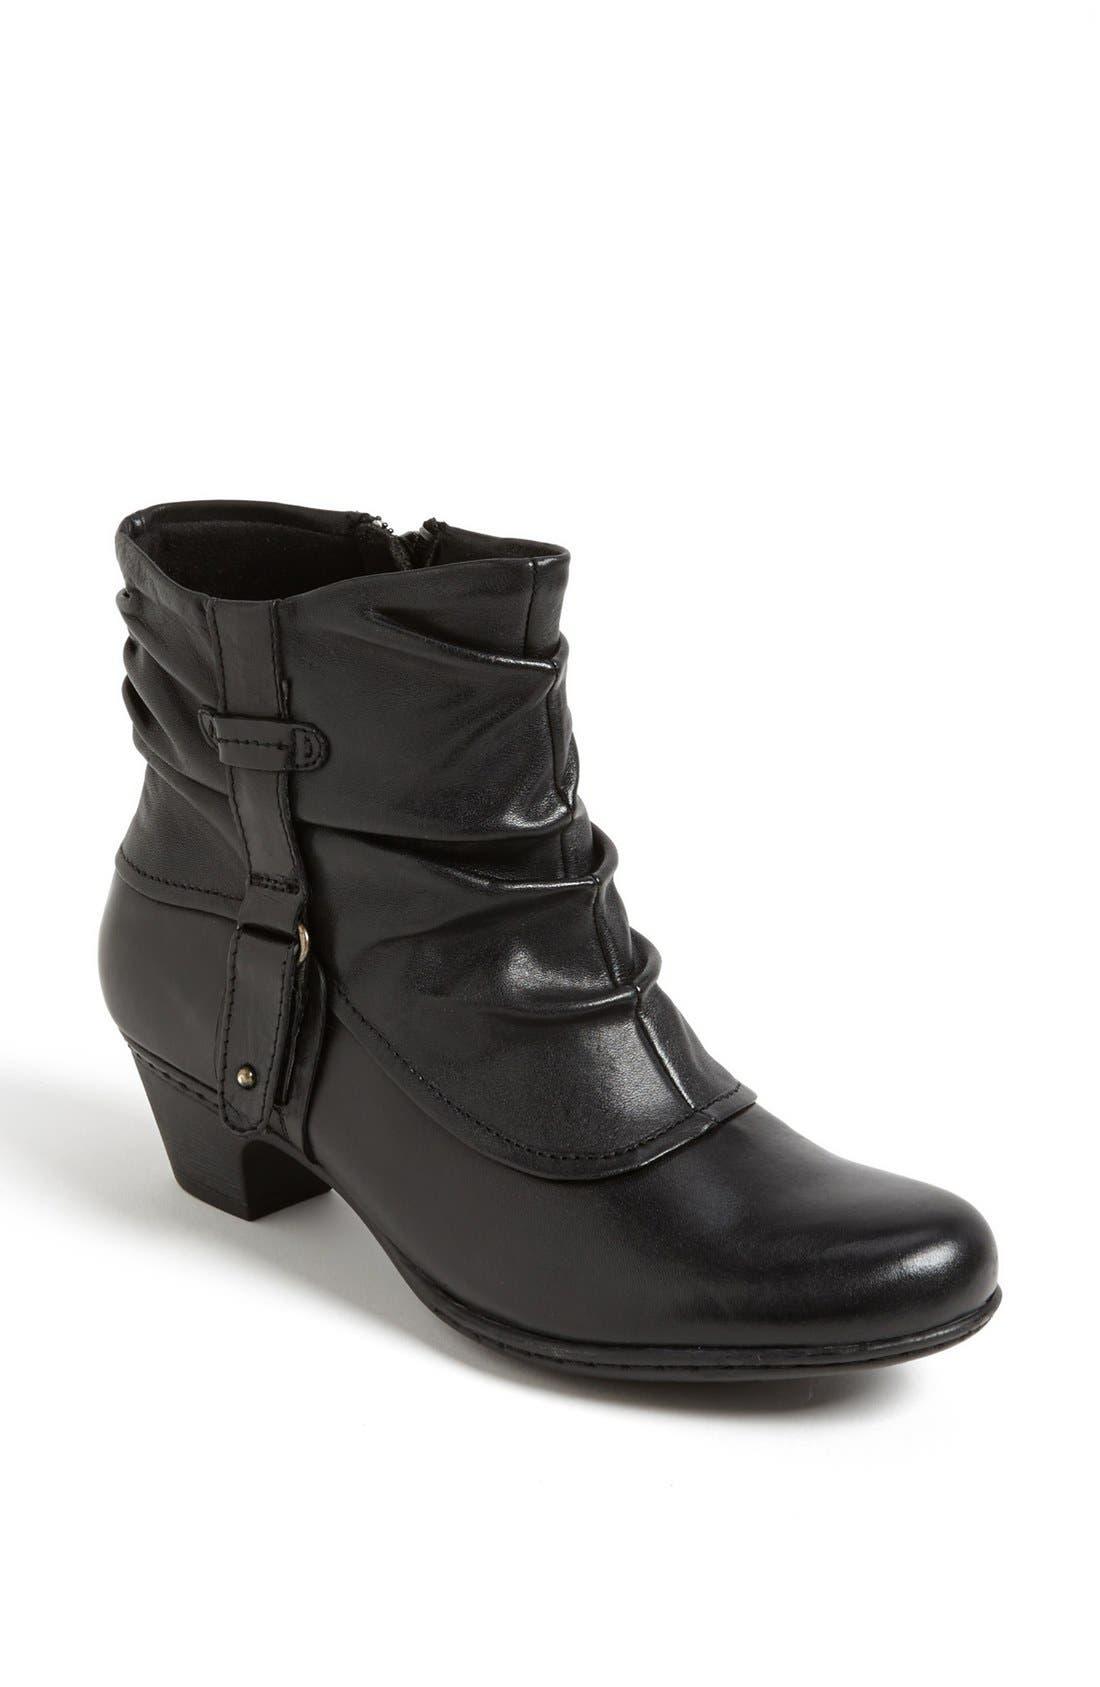 Main Image - Rockport Cobb Hill 'Alexandra' Boot